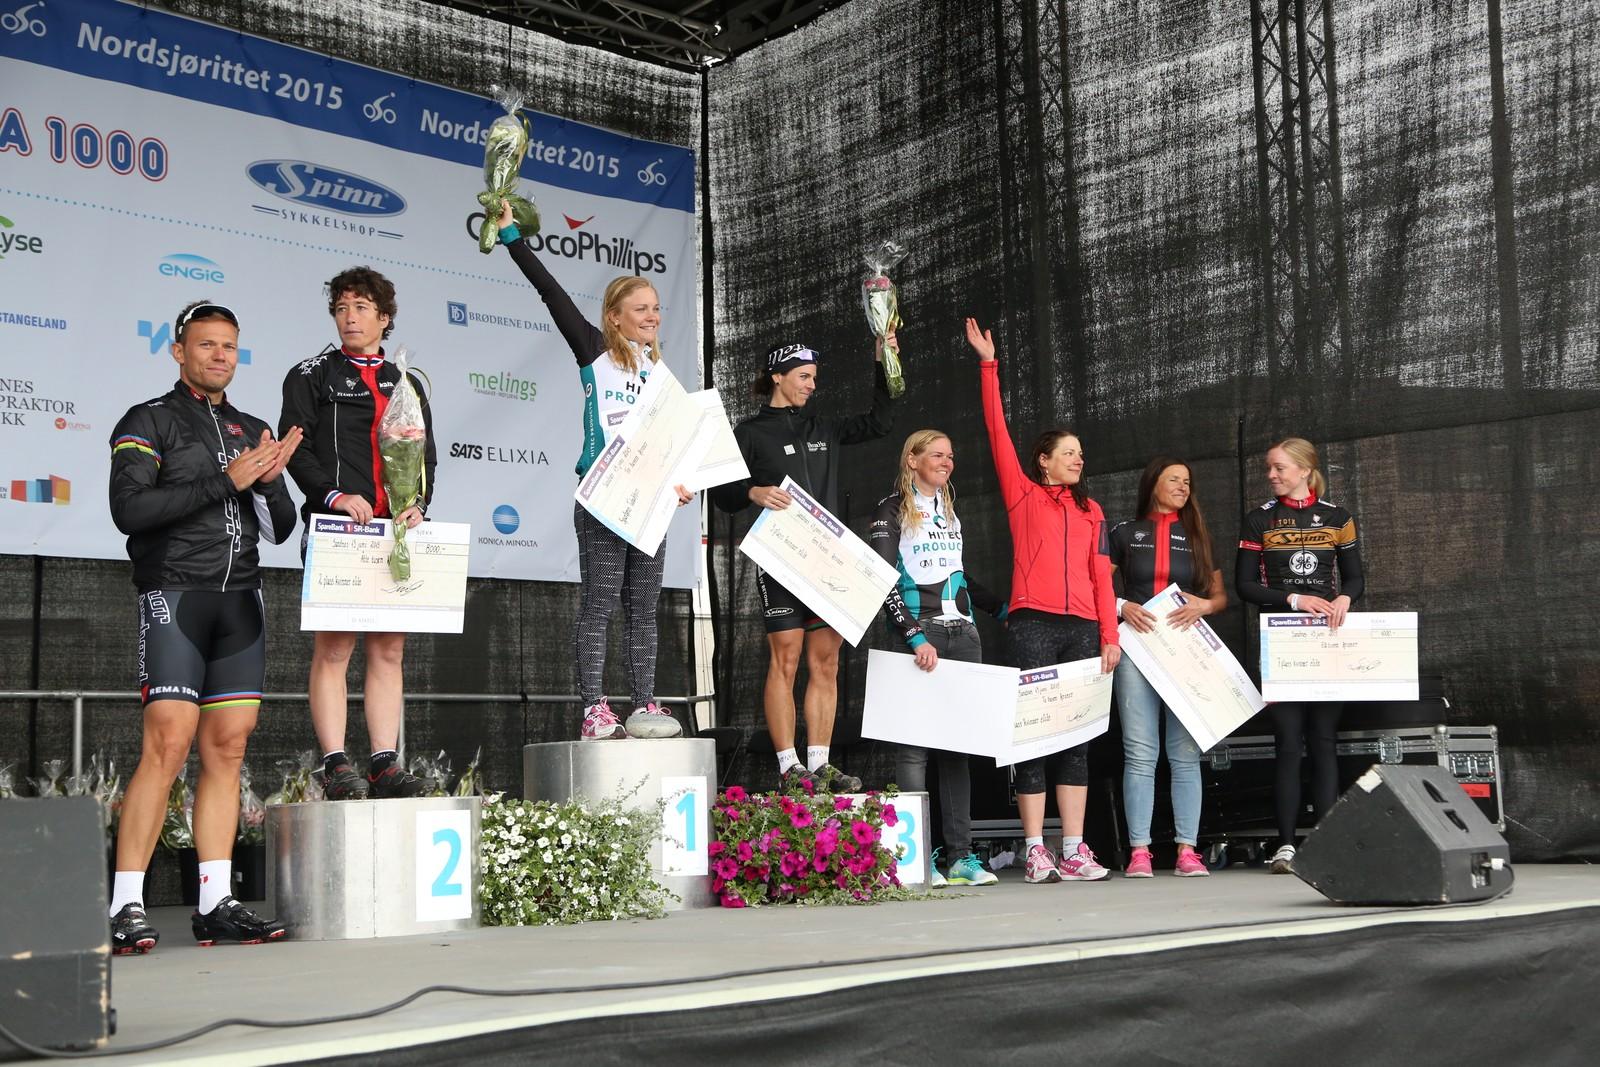 Emilie Moberg fra Team Hitec Products vant Eliteklassen. Hun ble nummer to totalt bak junior Susanne Andersen.